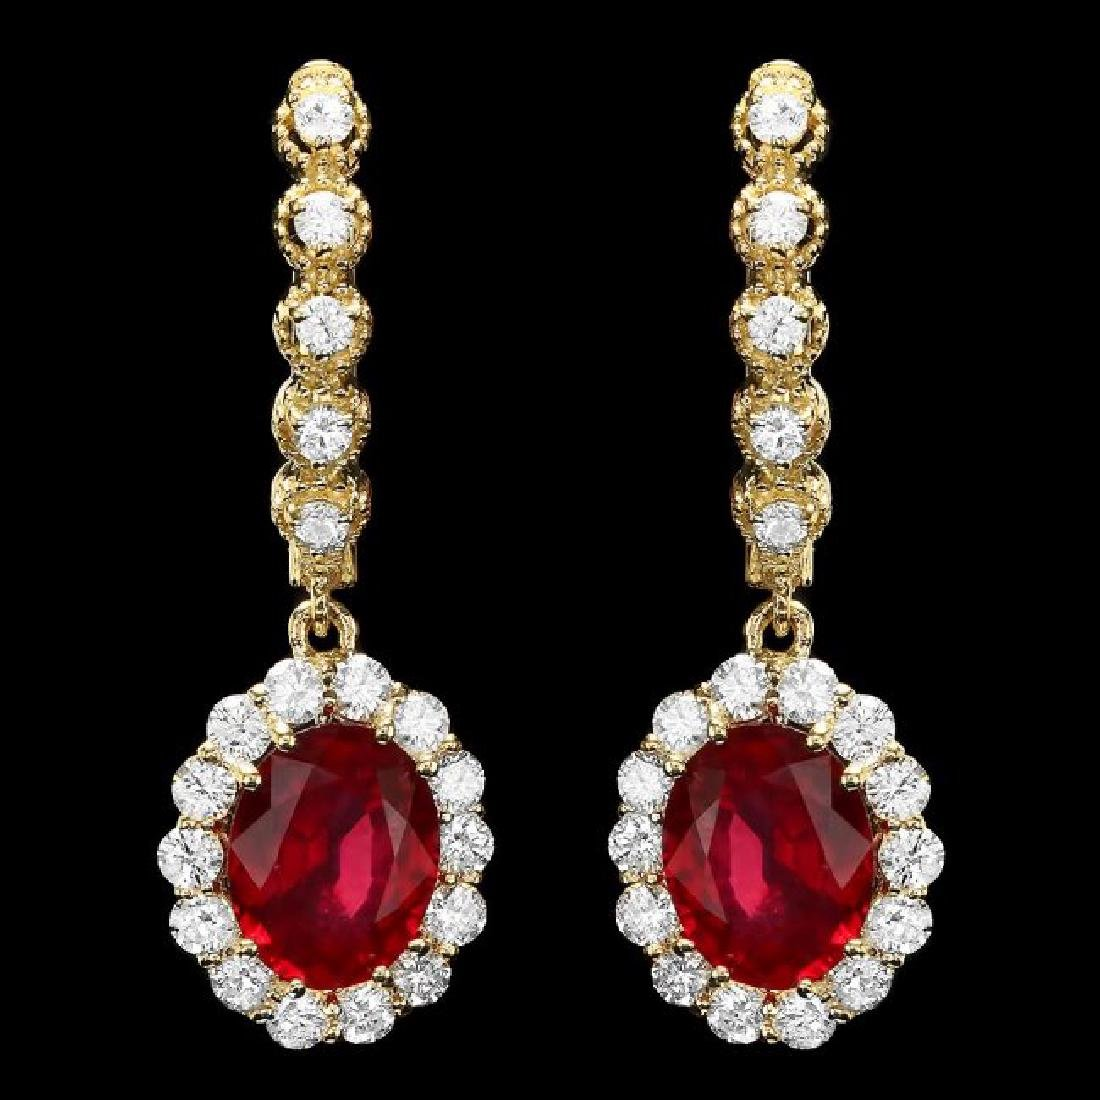 14k Gold 5.3ct Ruby 1.40ct Diamond Earrings